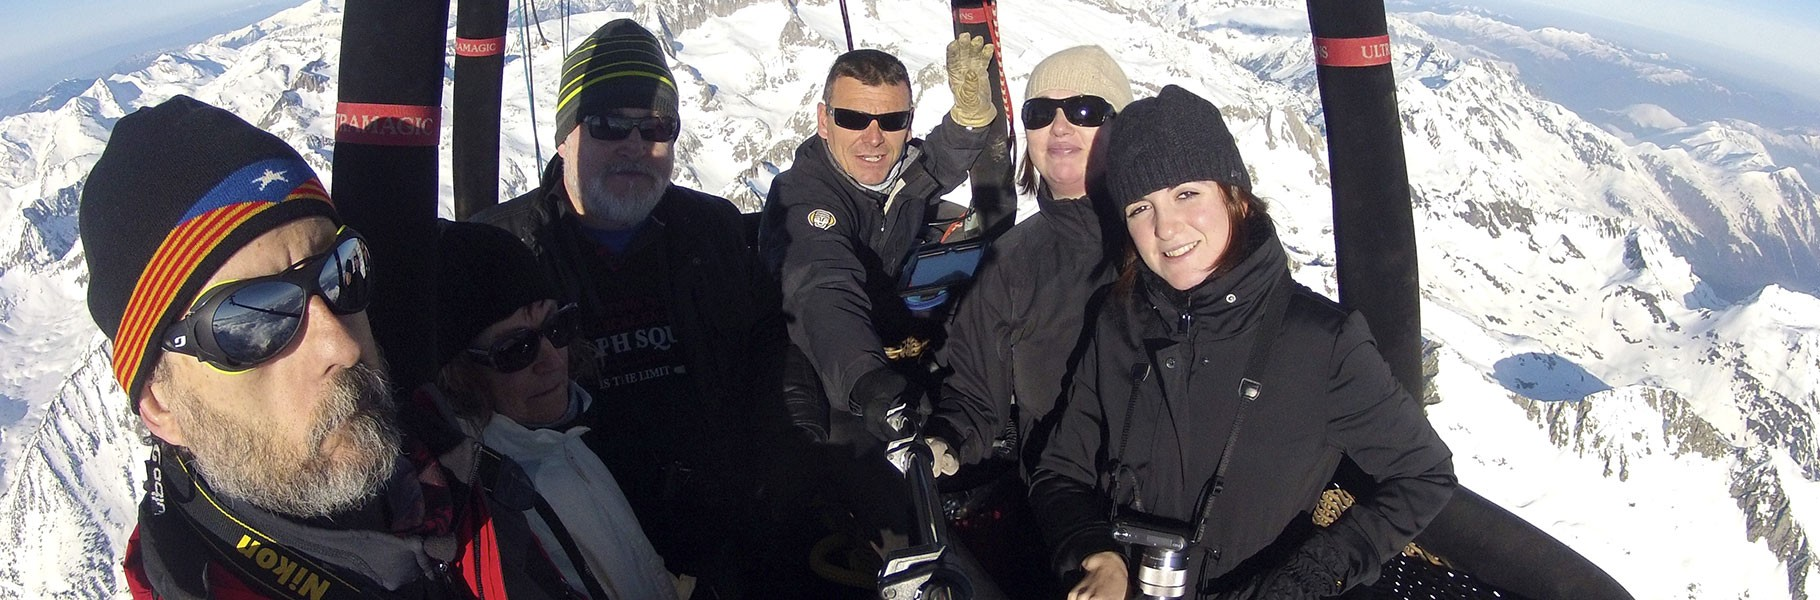 Travessa dels Pirineus en globus